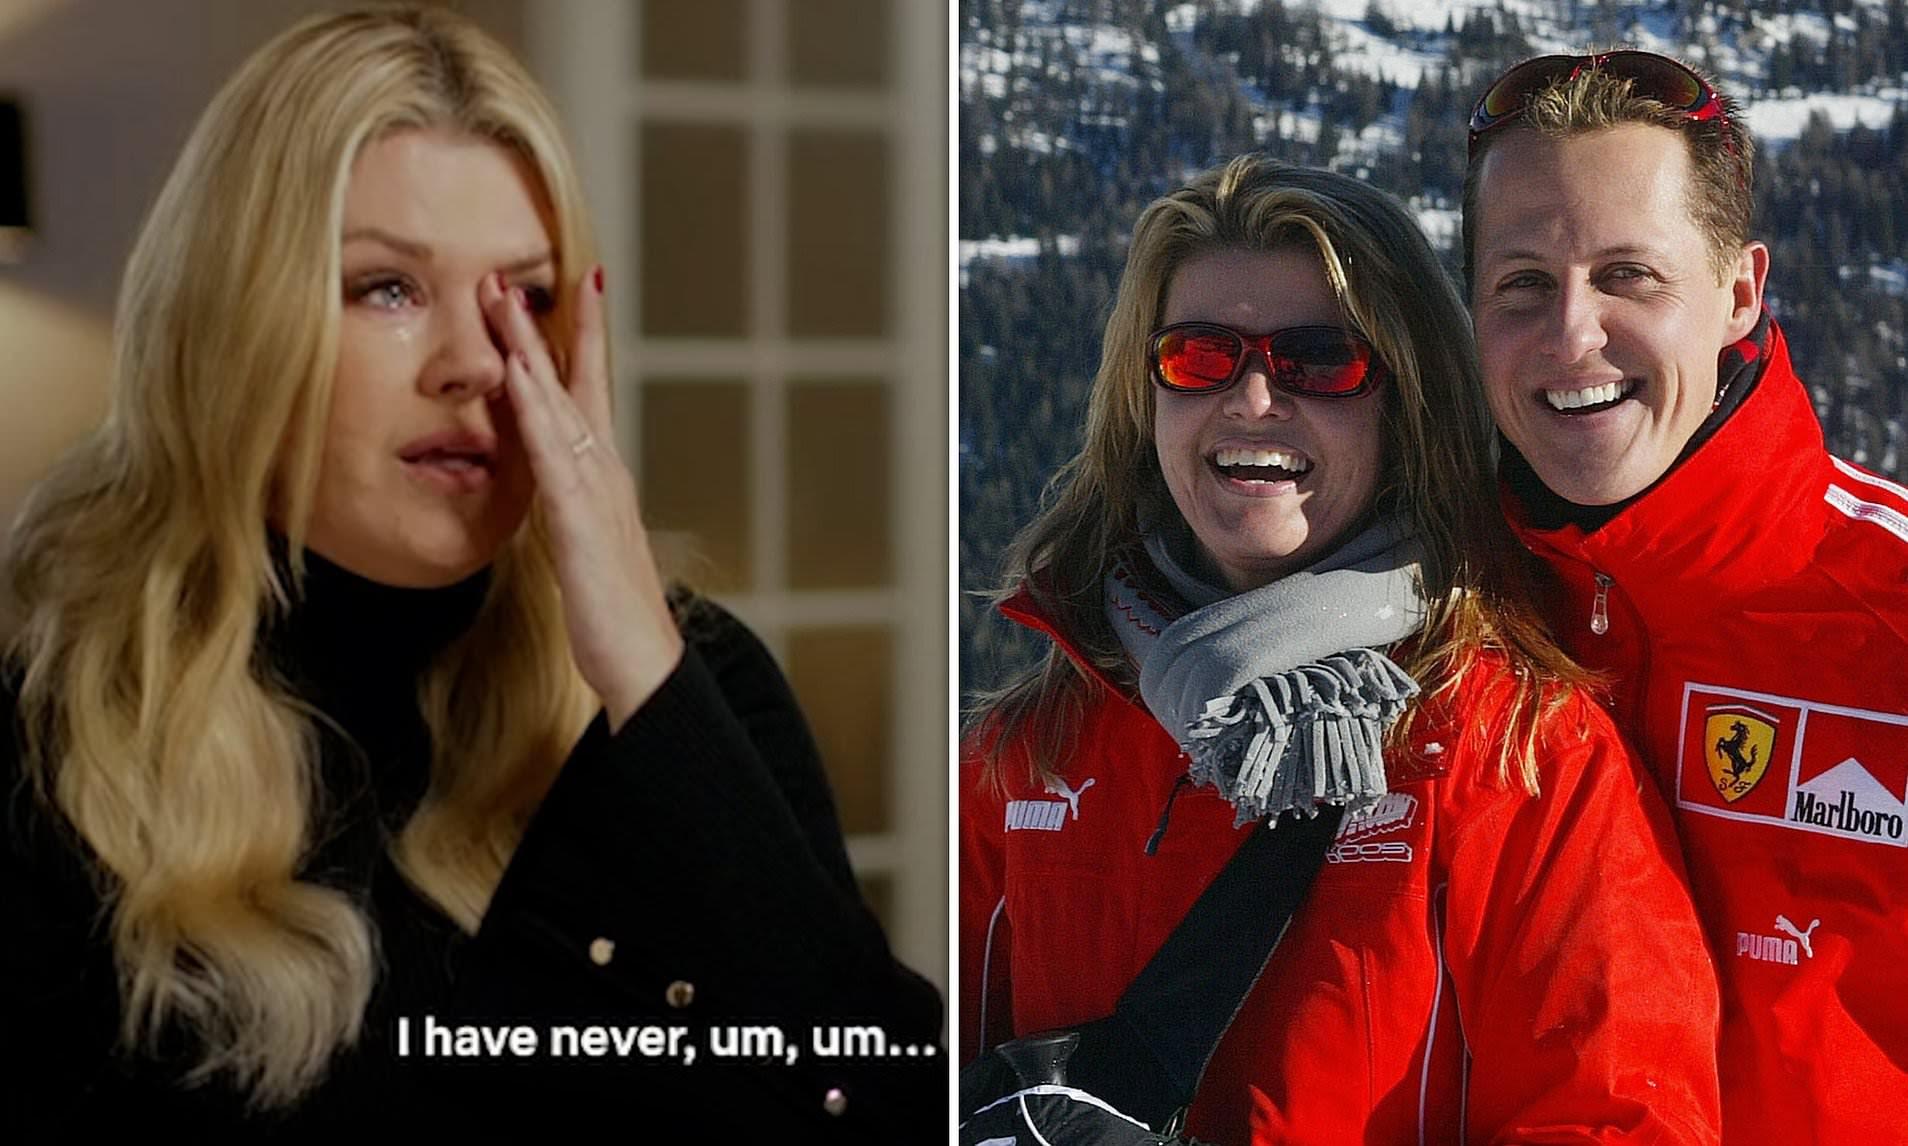 Moment Corrina Schumacher breaks down in tears in rare interview